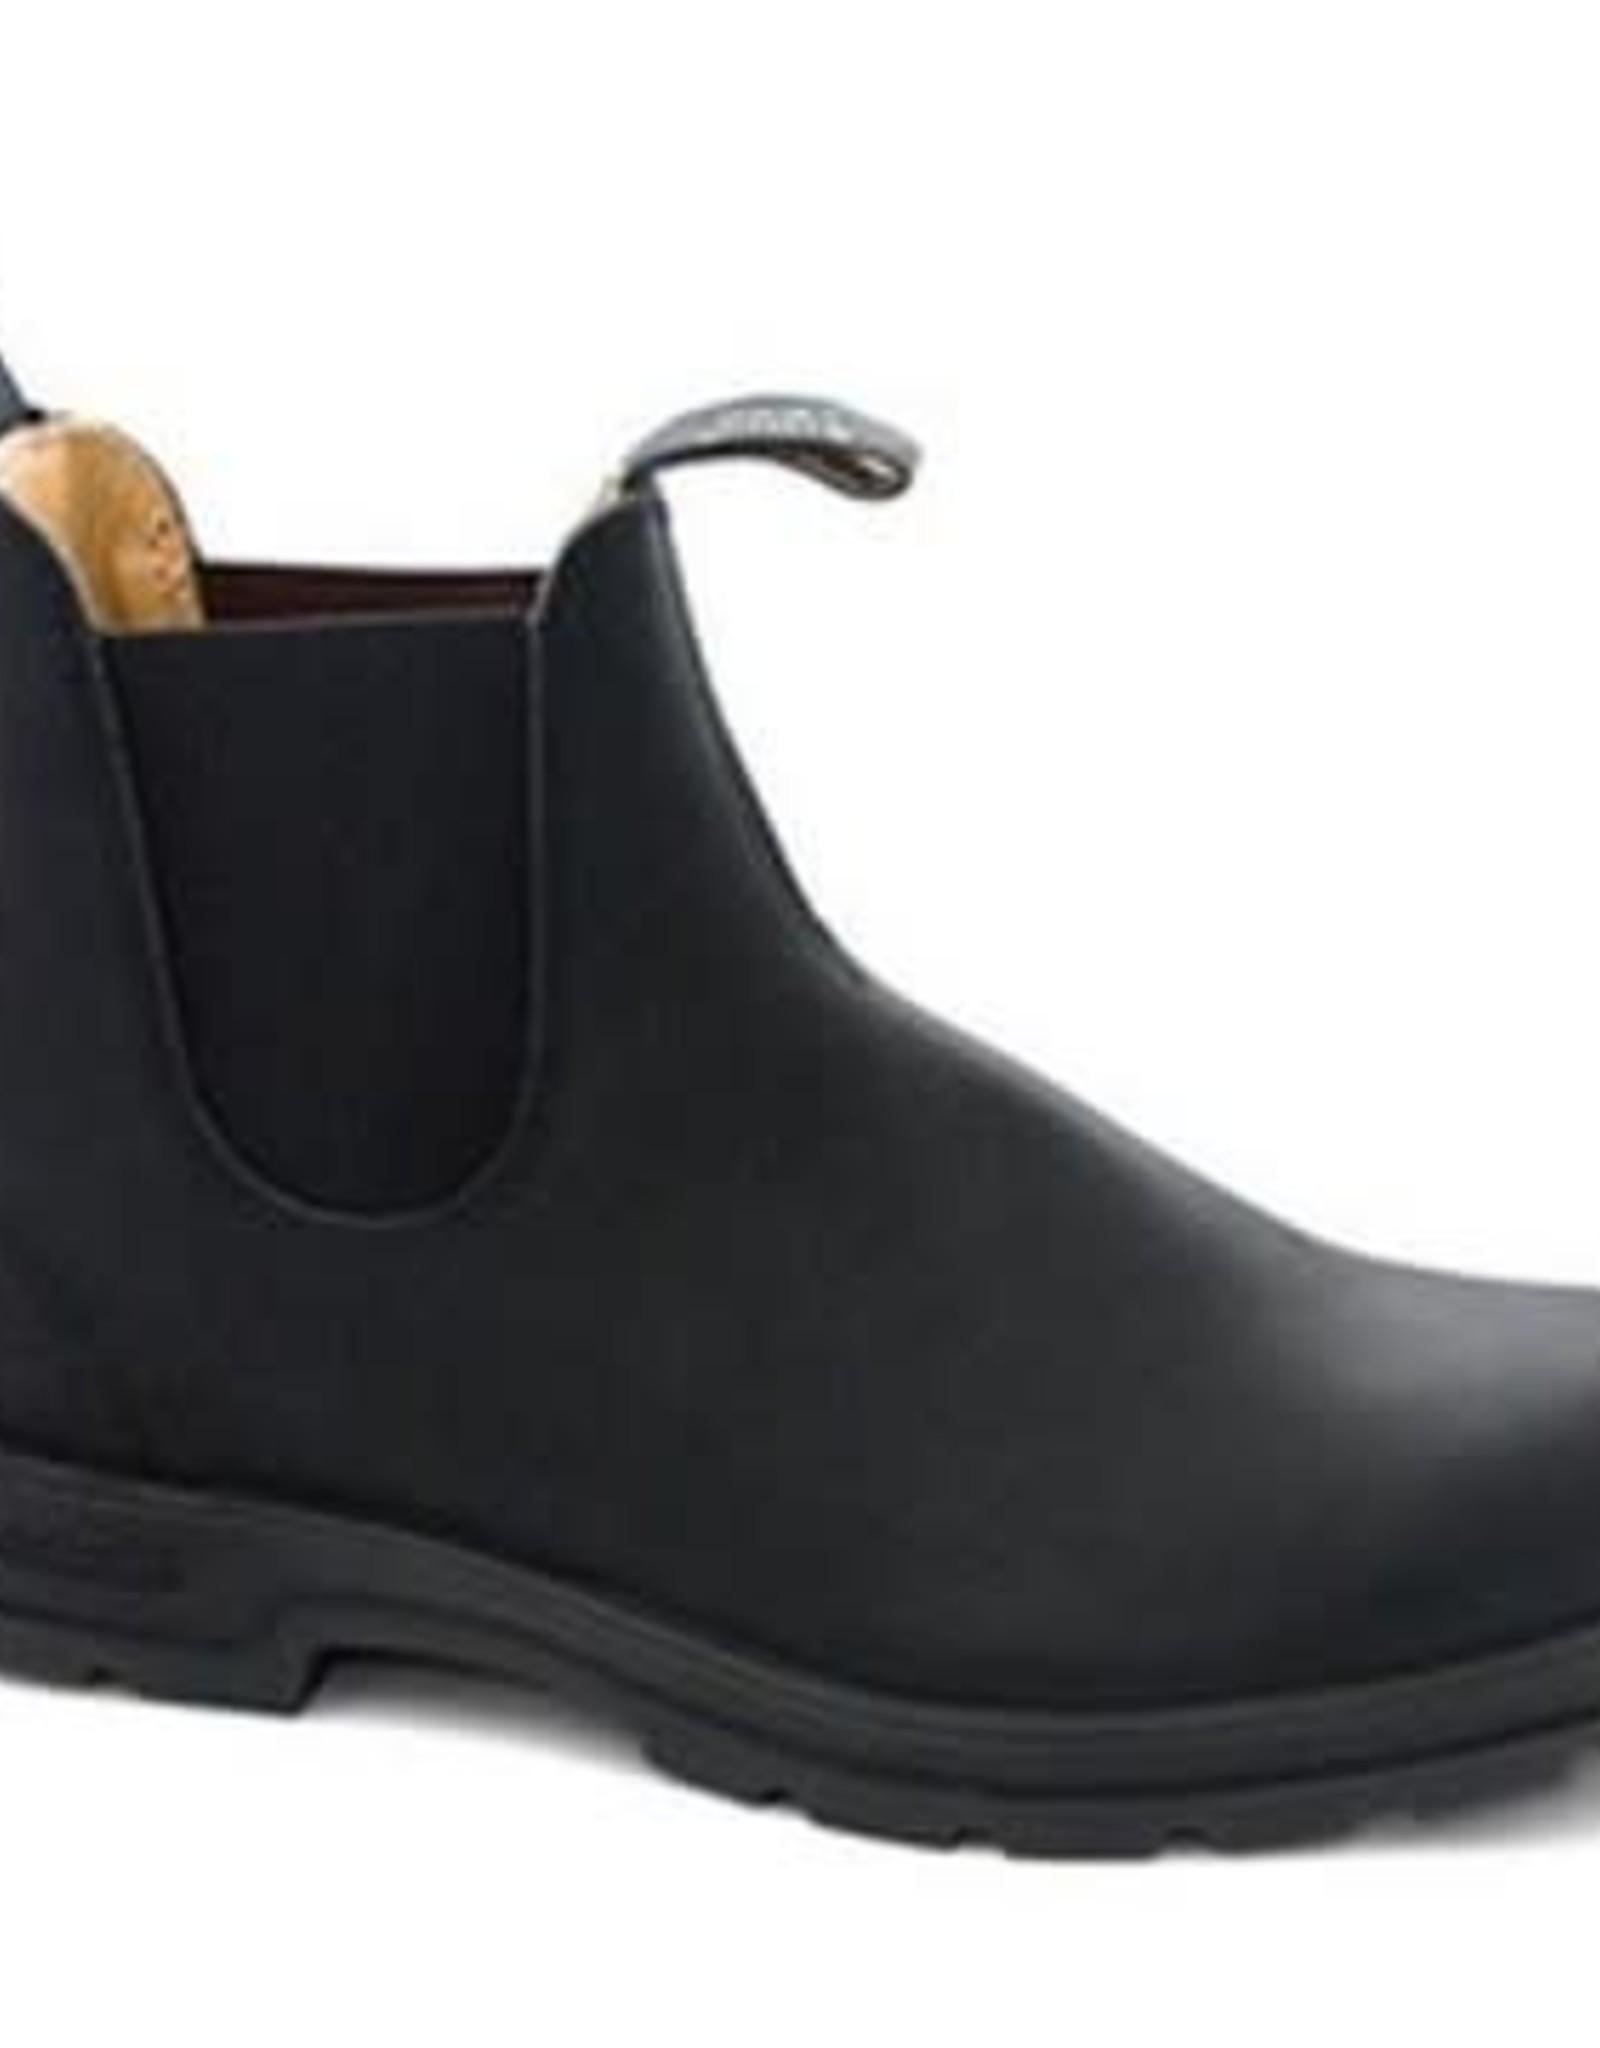 Blundstone Blundstone, 558  Leather Lined Black , 1WIDTH, 10.5